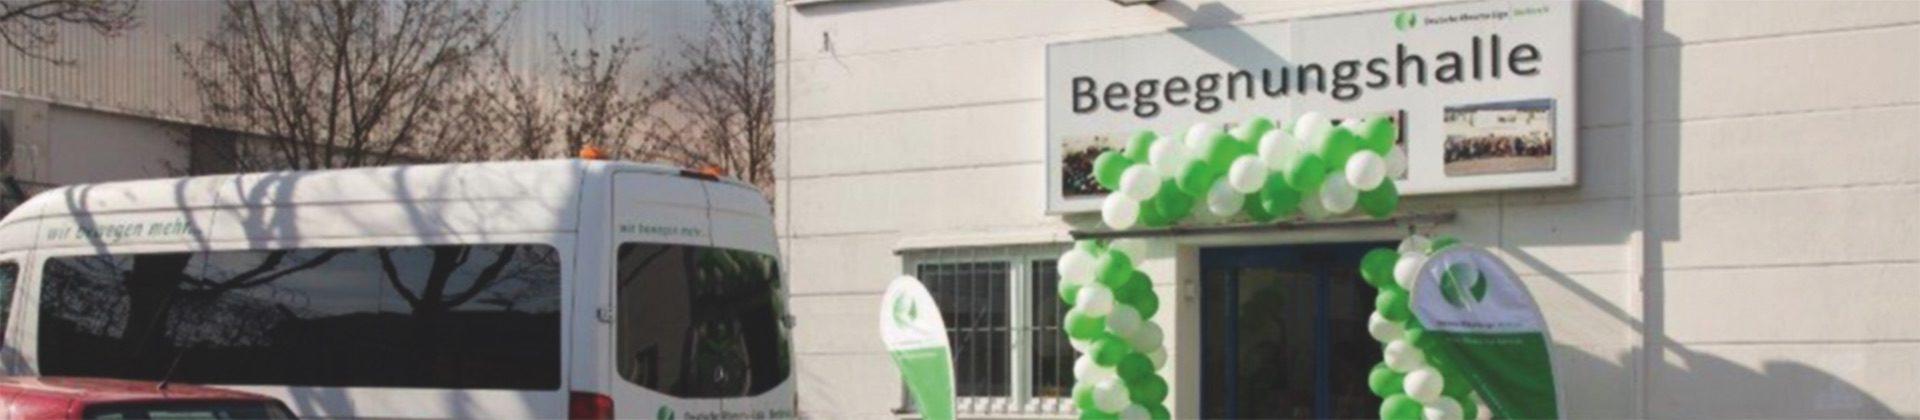 Begegnungshalle-Rheuma-Liga-Berlin-1920px423px